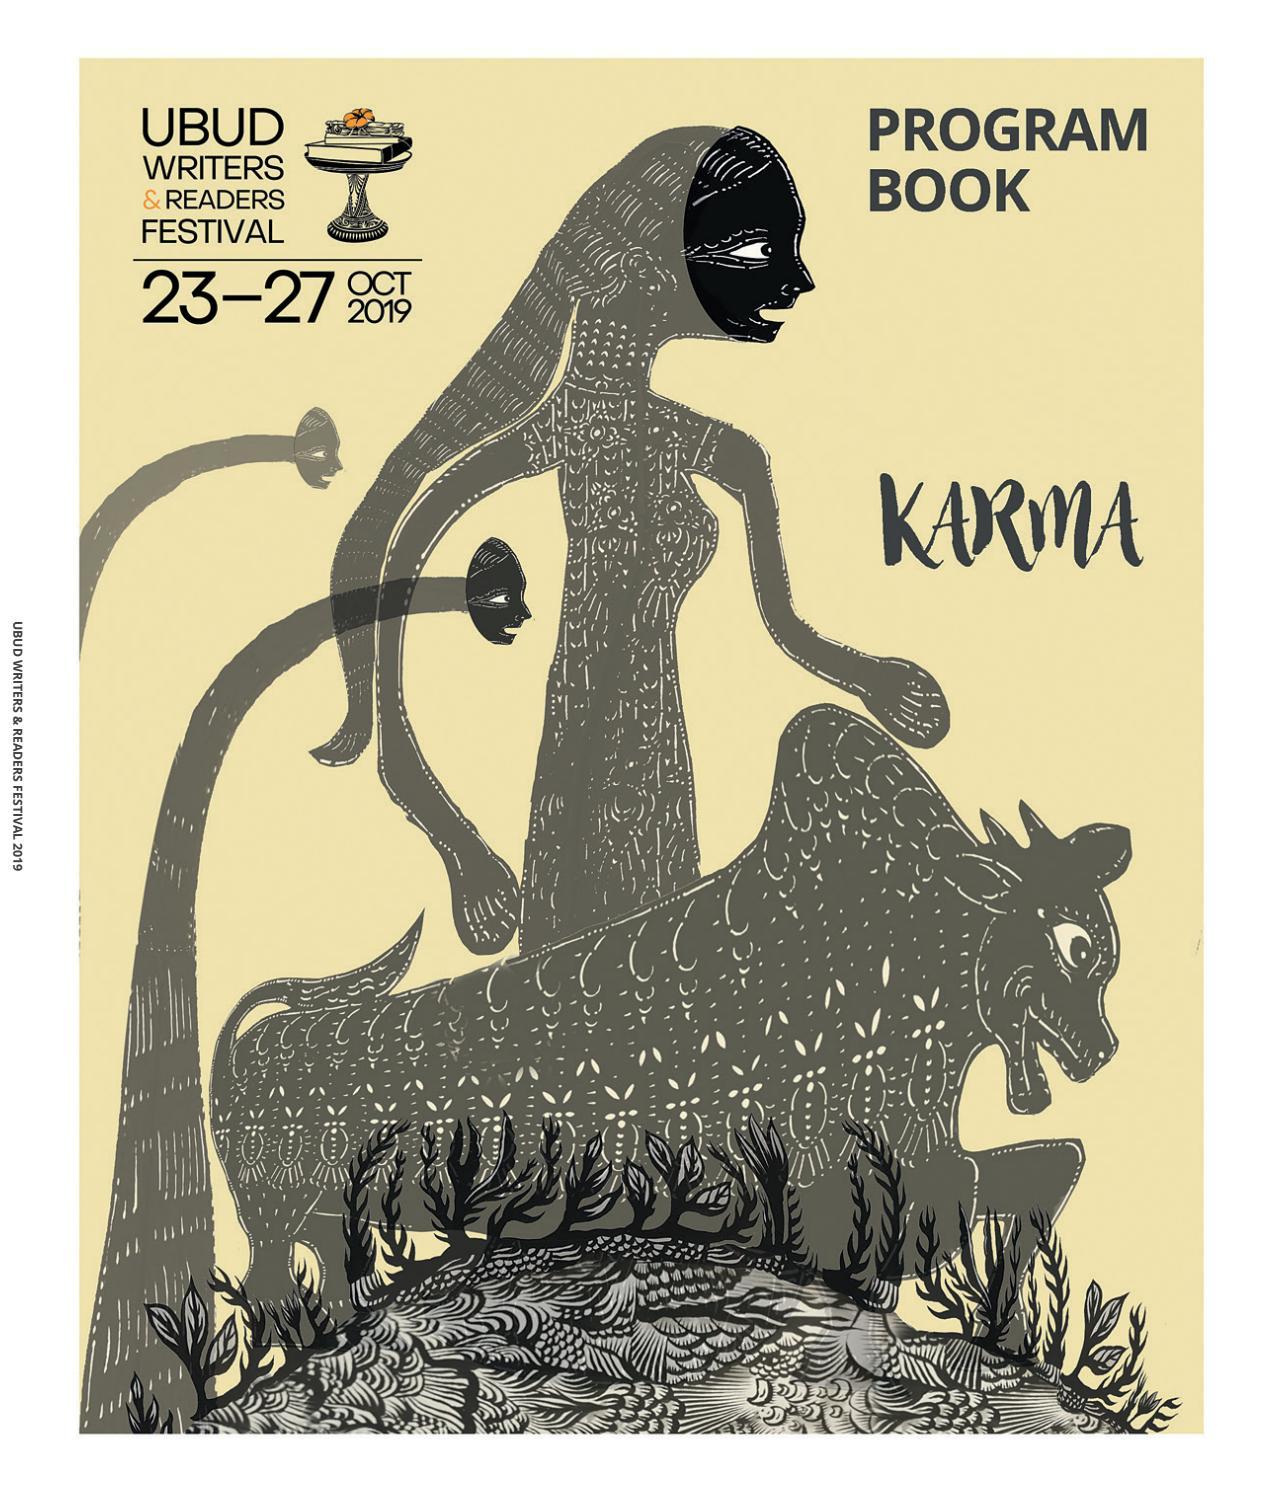 Ubud Writers Readers Festival 2019 Program Book By Ubud